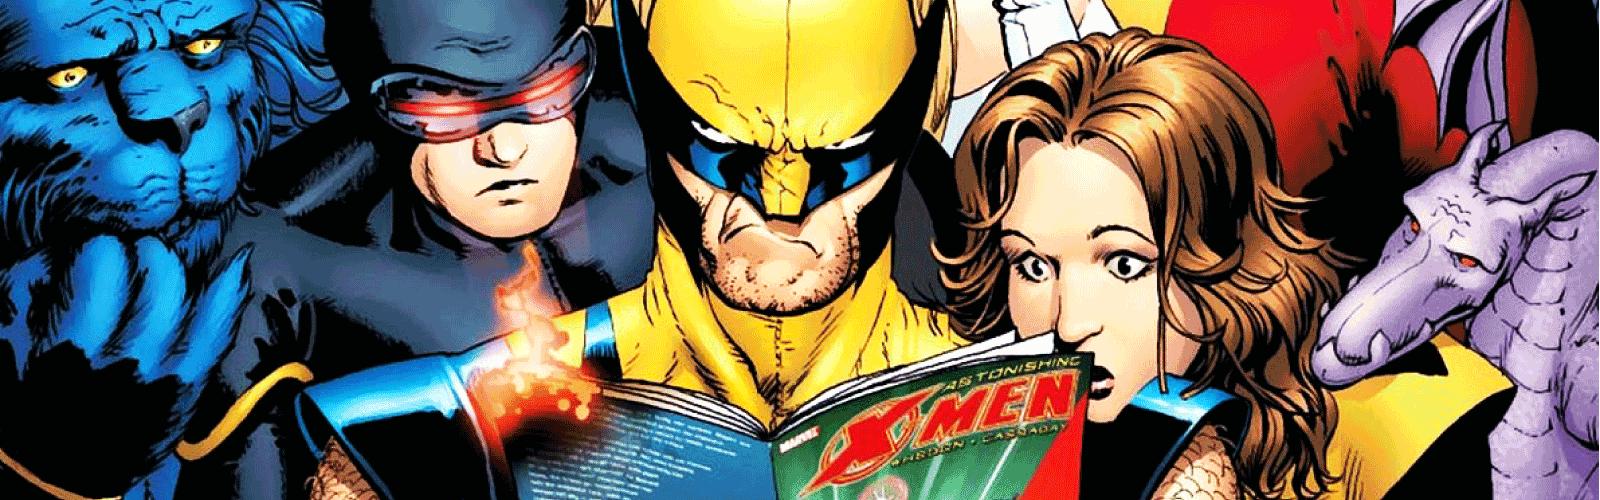 Ace Comics New Releases